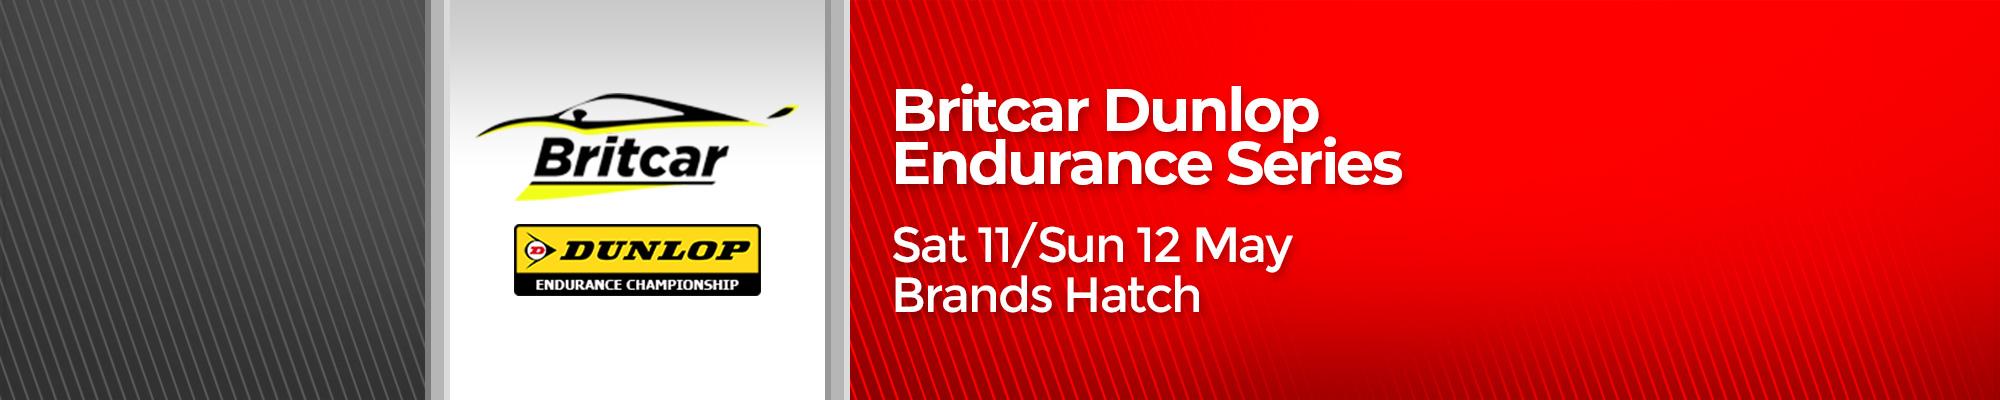 Britcar Dunlop Endurance Series